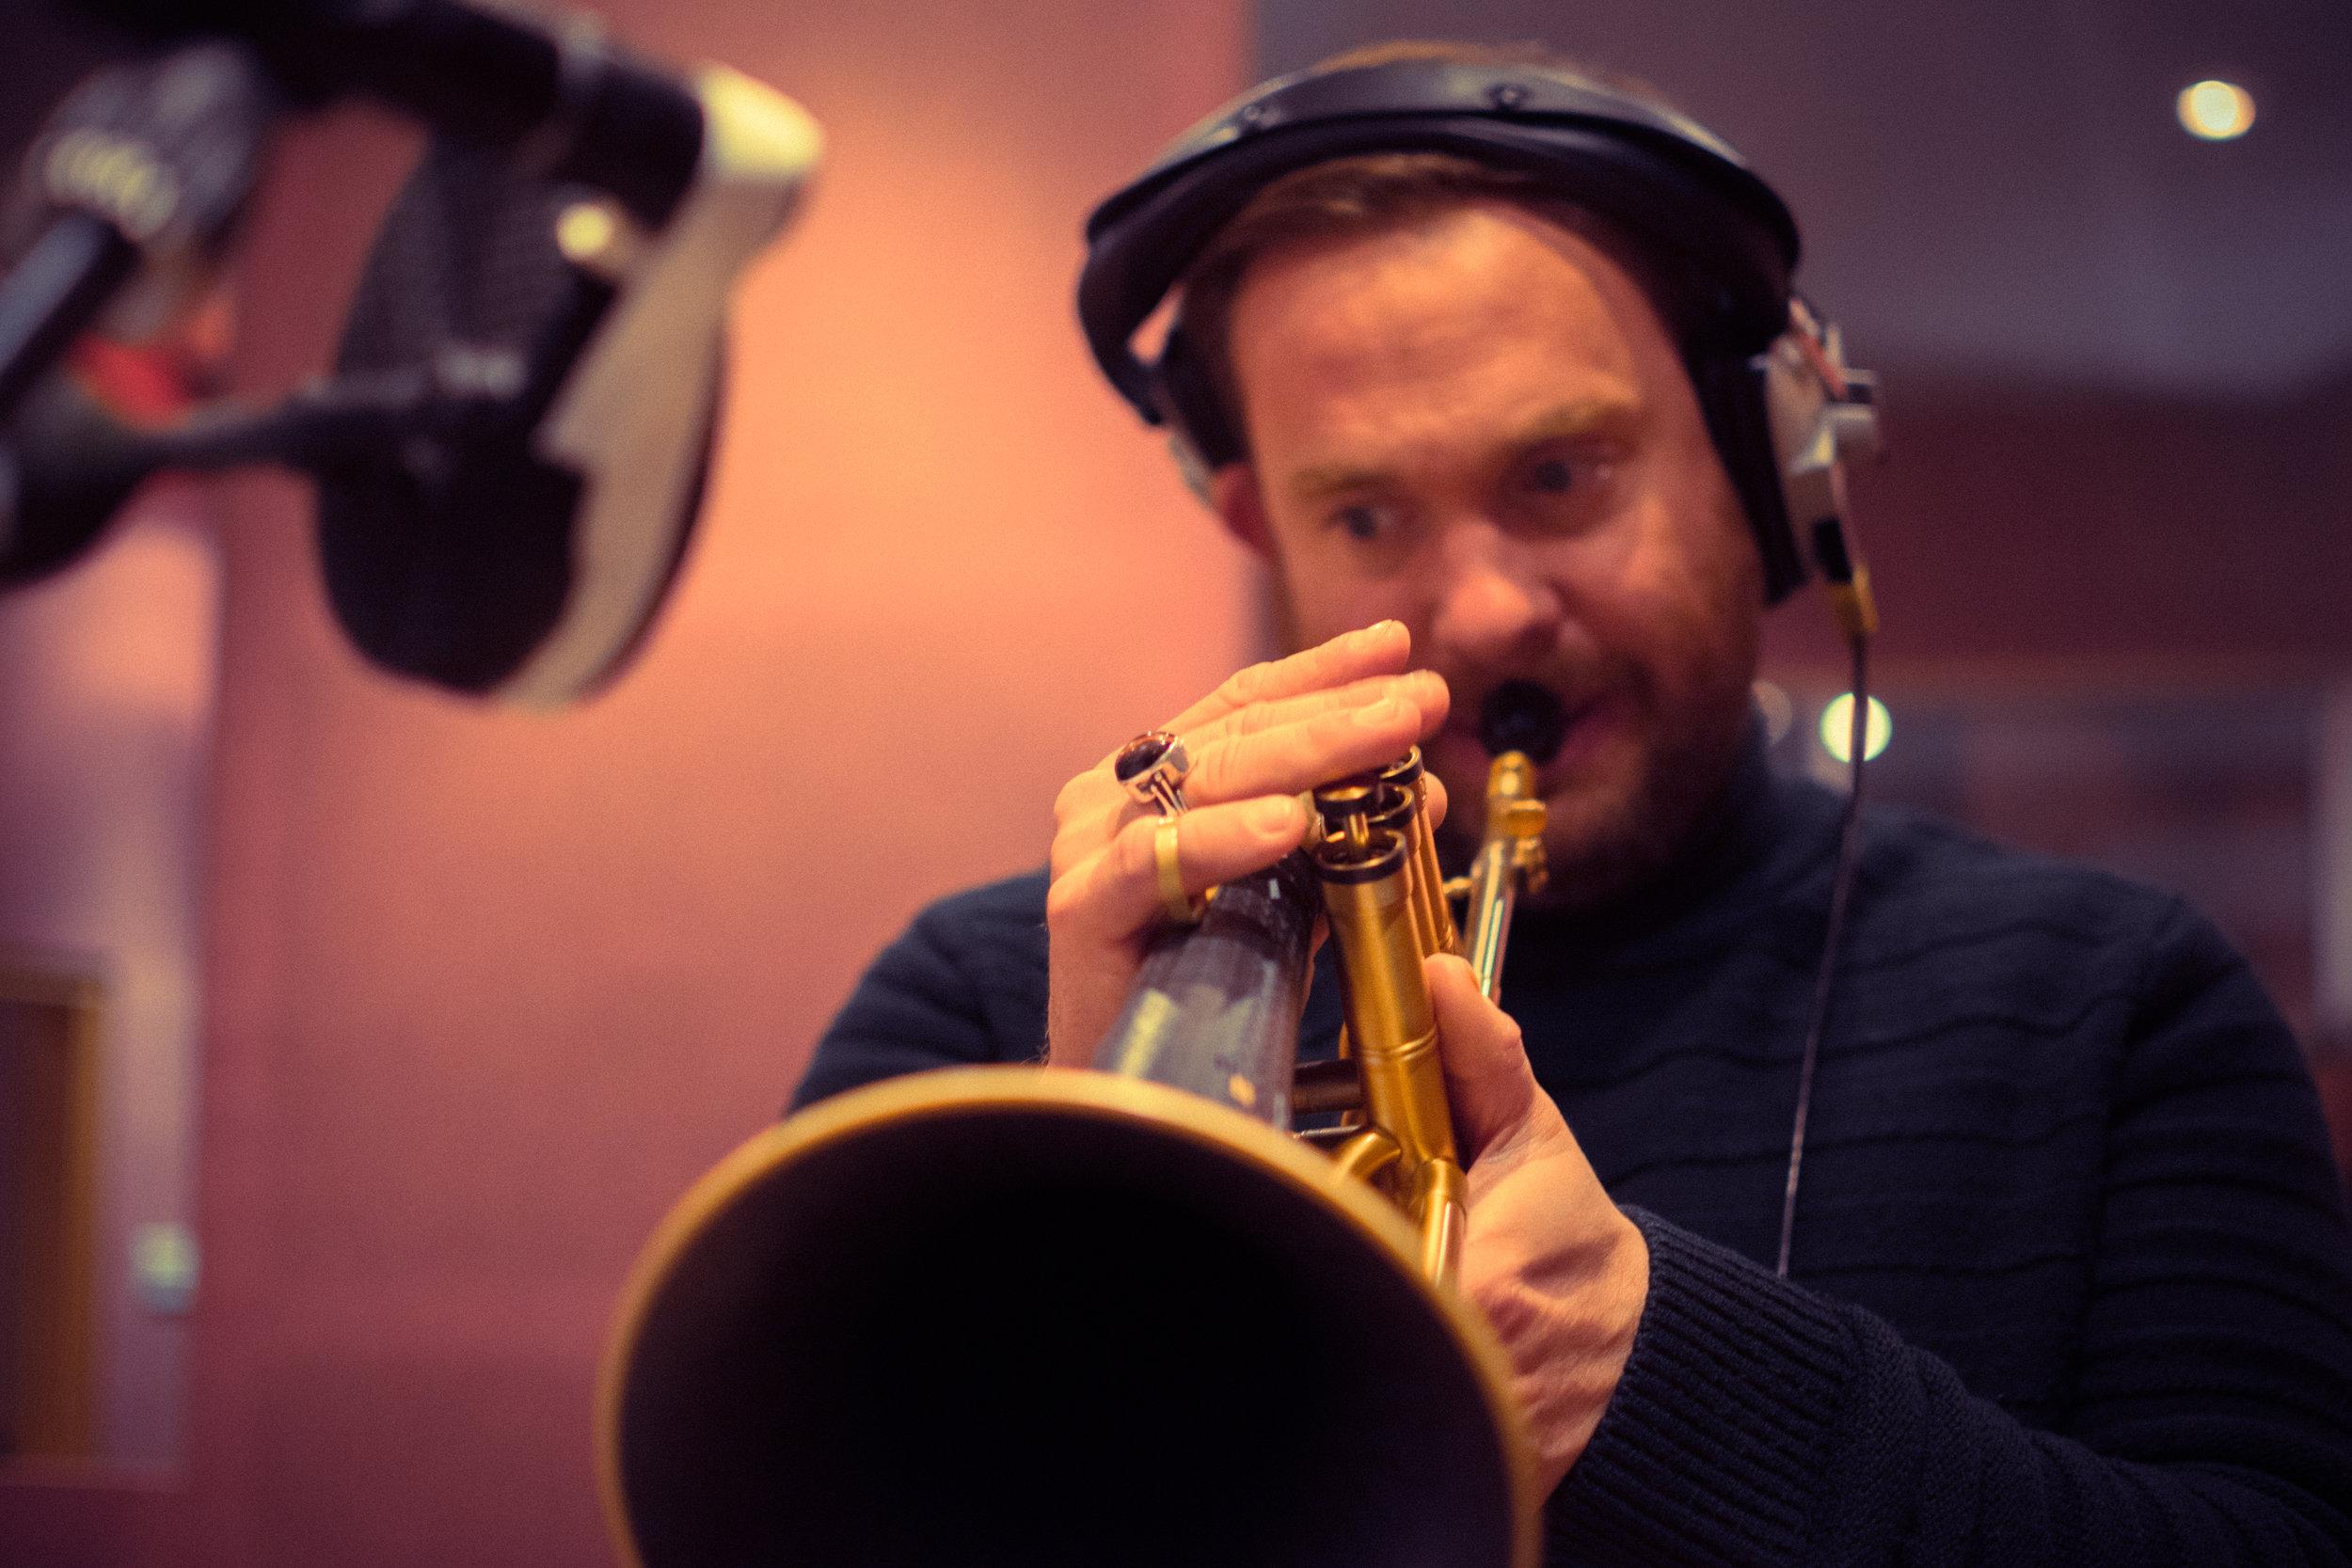 Quentin Collins (photograph: Goat Noise Photography)